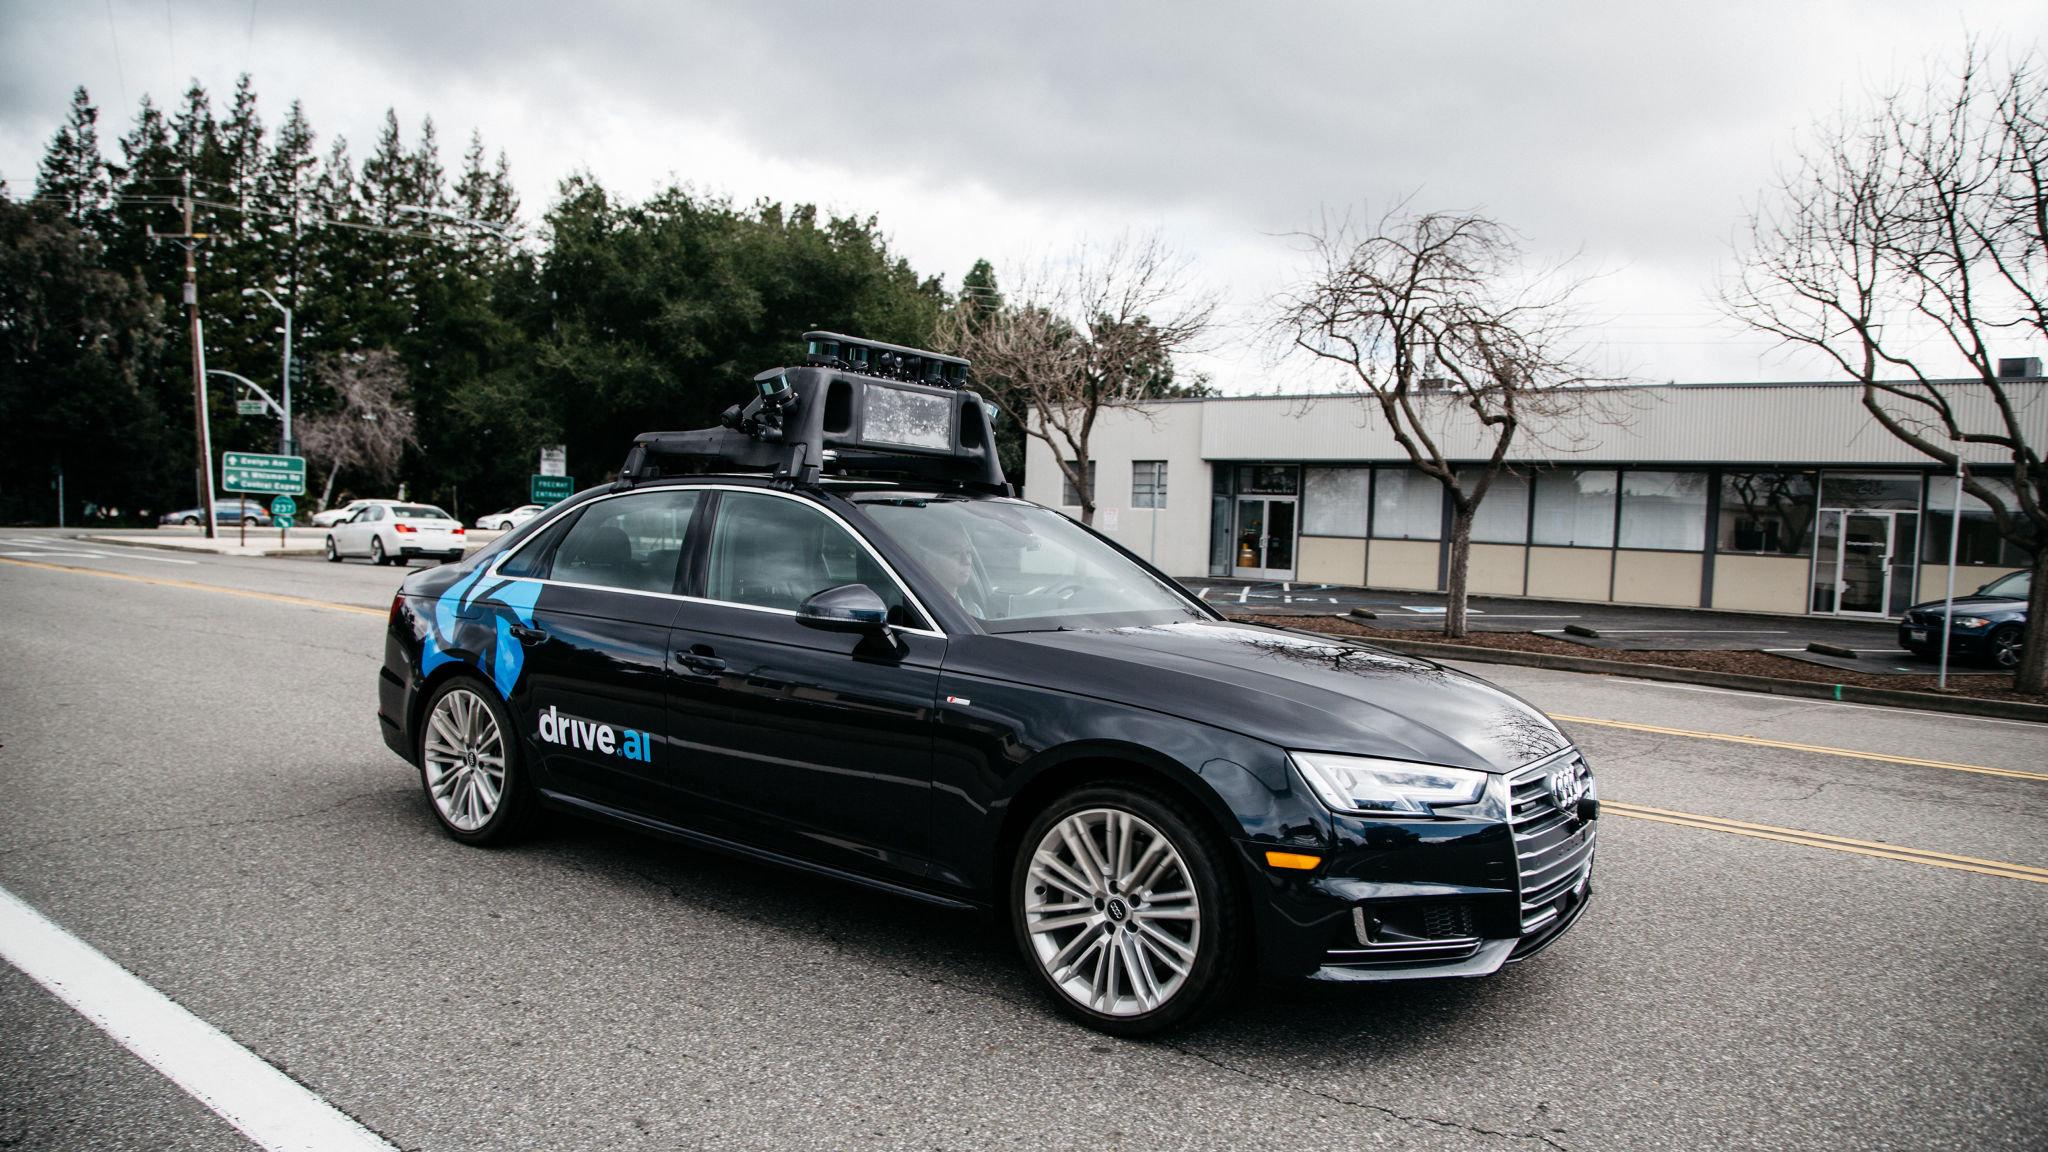 Apple buys autonomous vehicle start-up Drive.ai